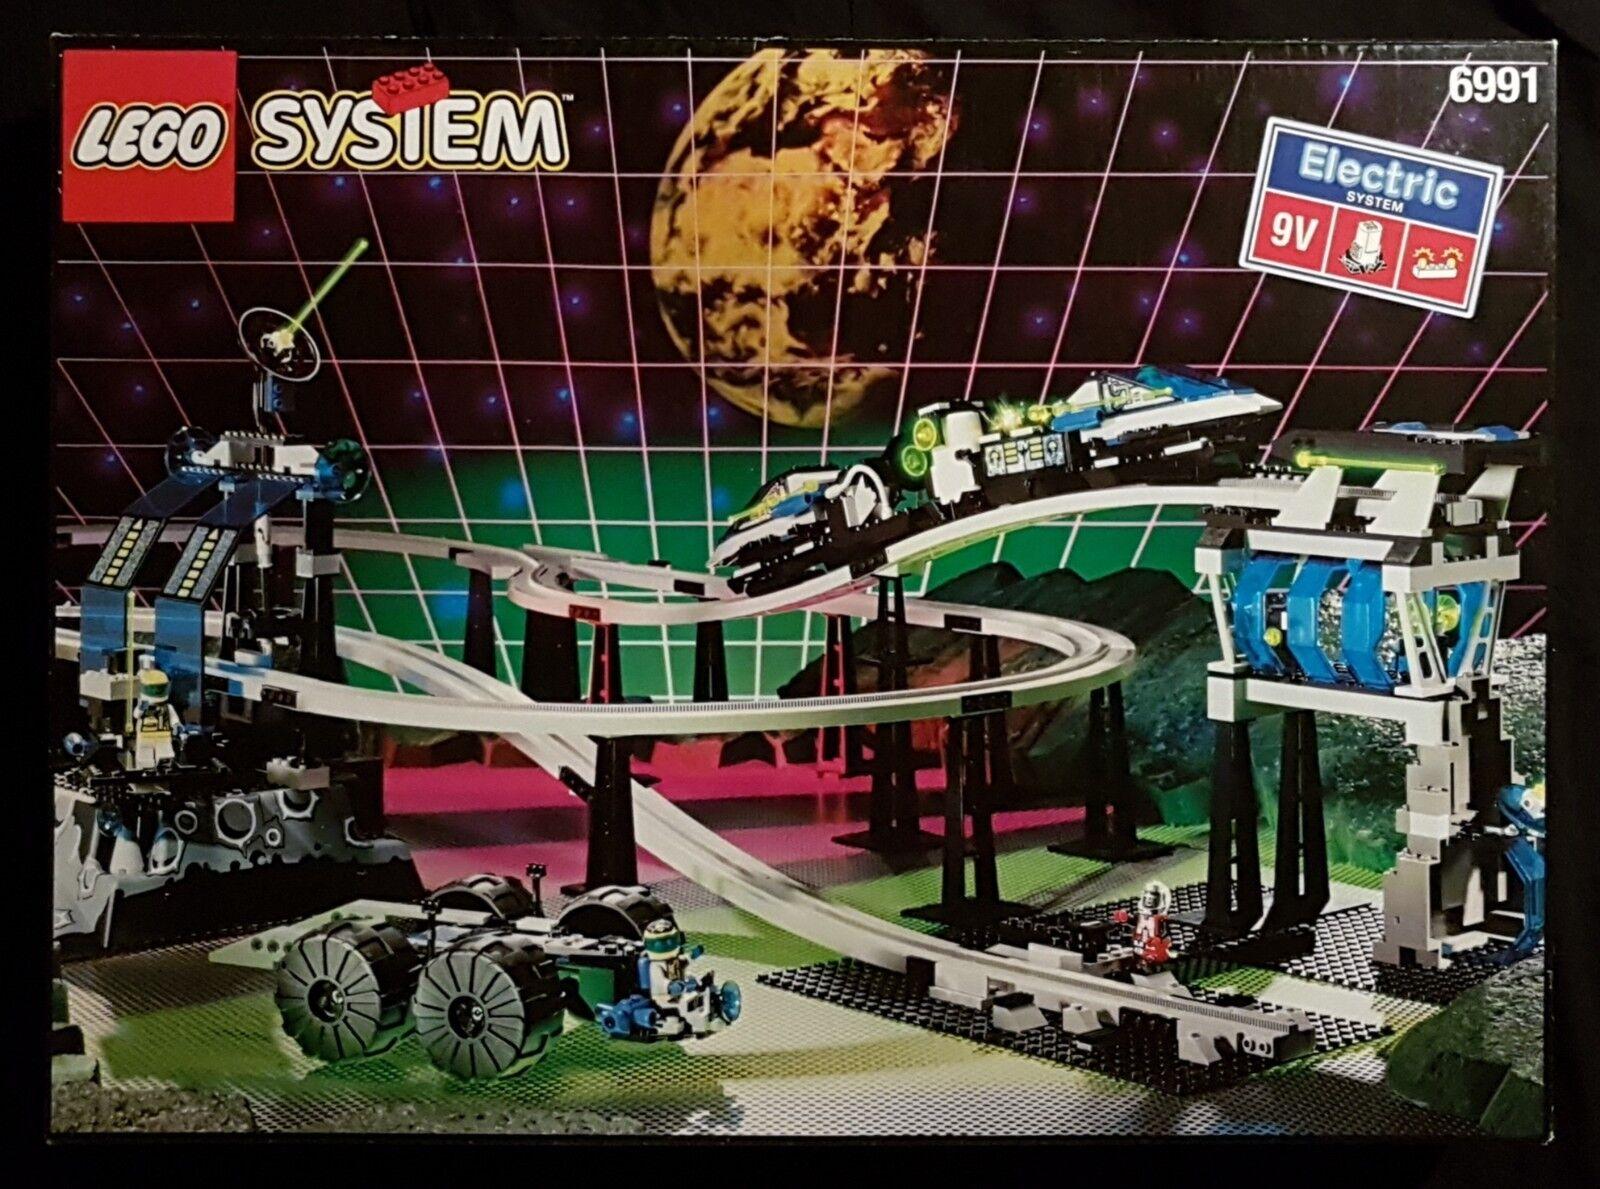 Lego 6991 - Monorail Transport Base - - - 1994 Unitron Space Classic - 90s Vintage dafc79